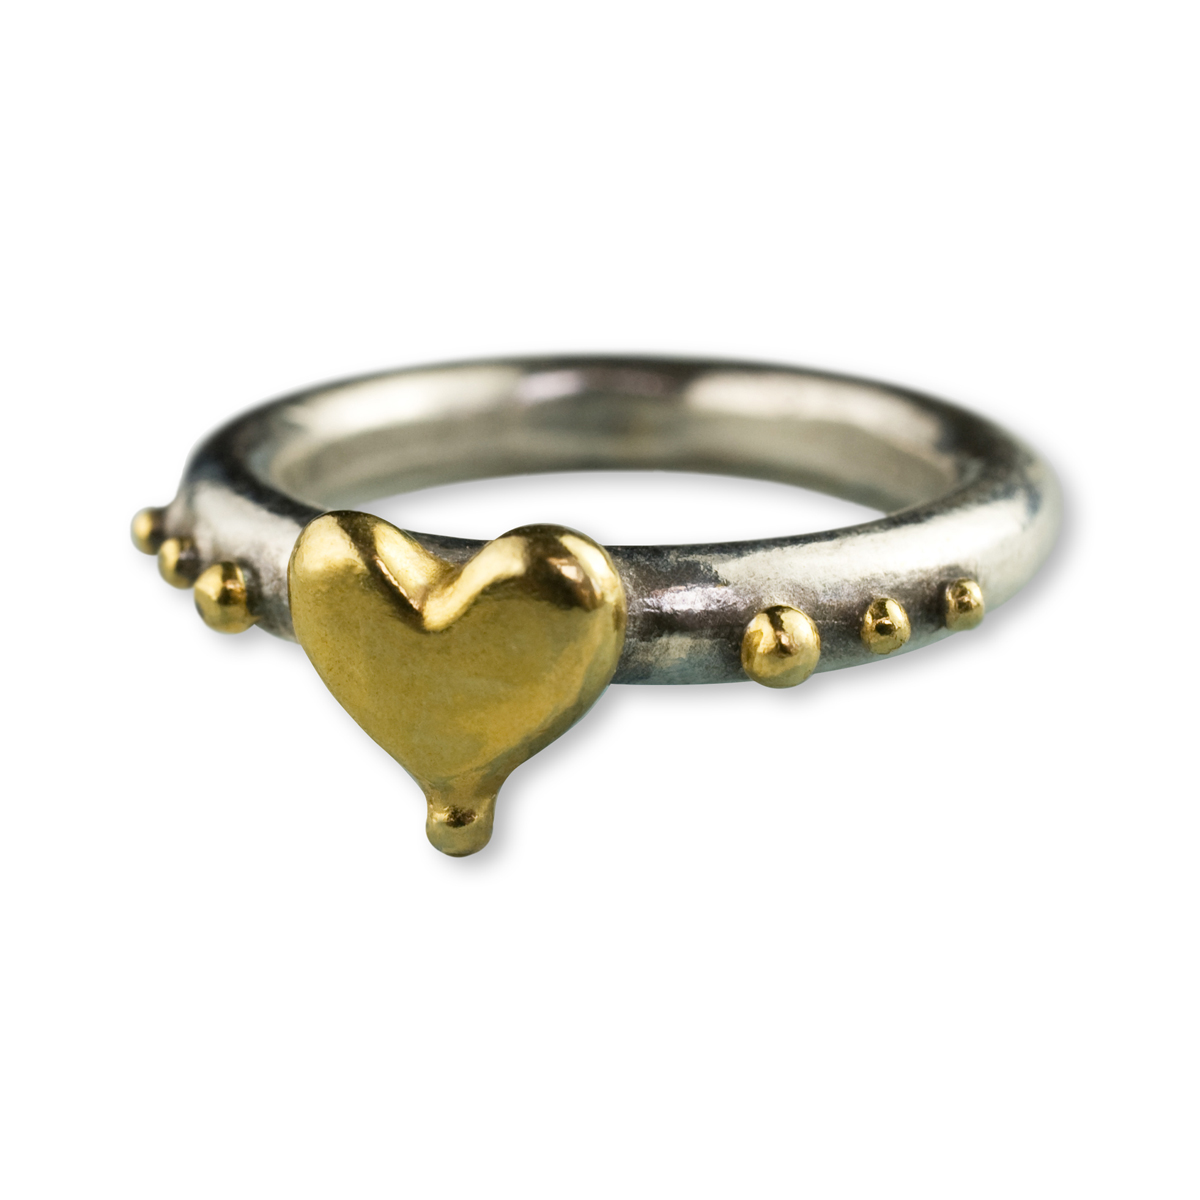 sophie harley heart ring.jpg